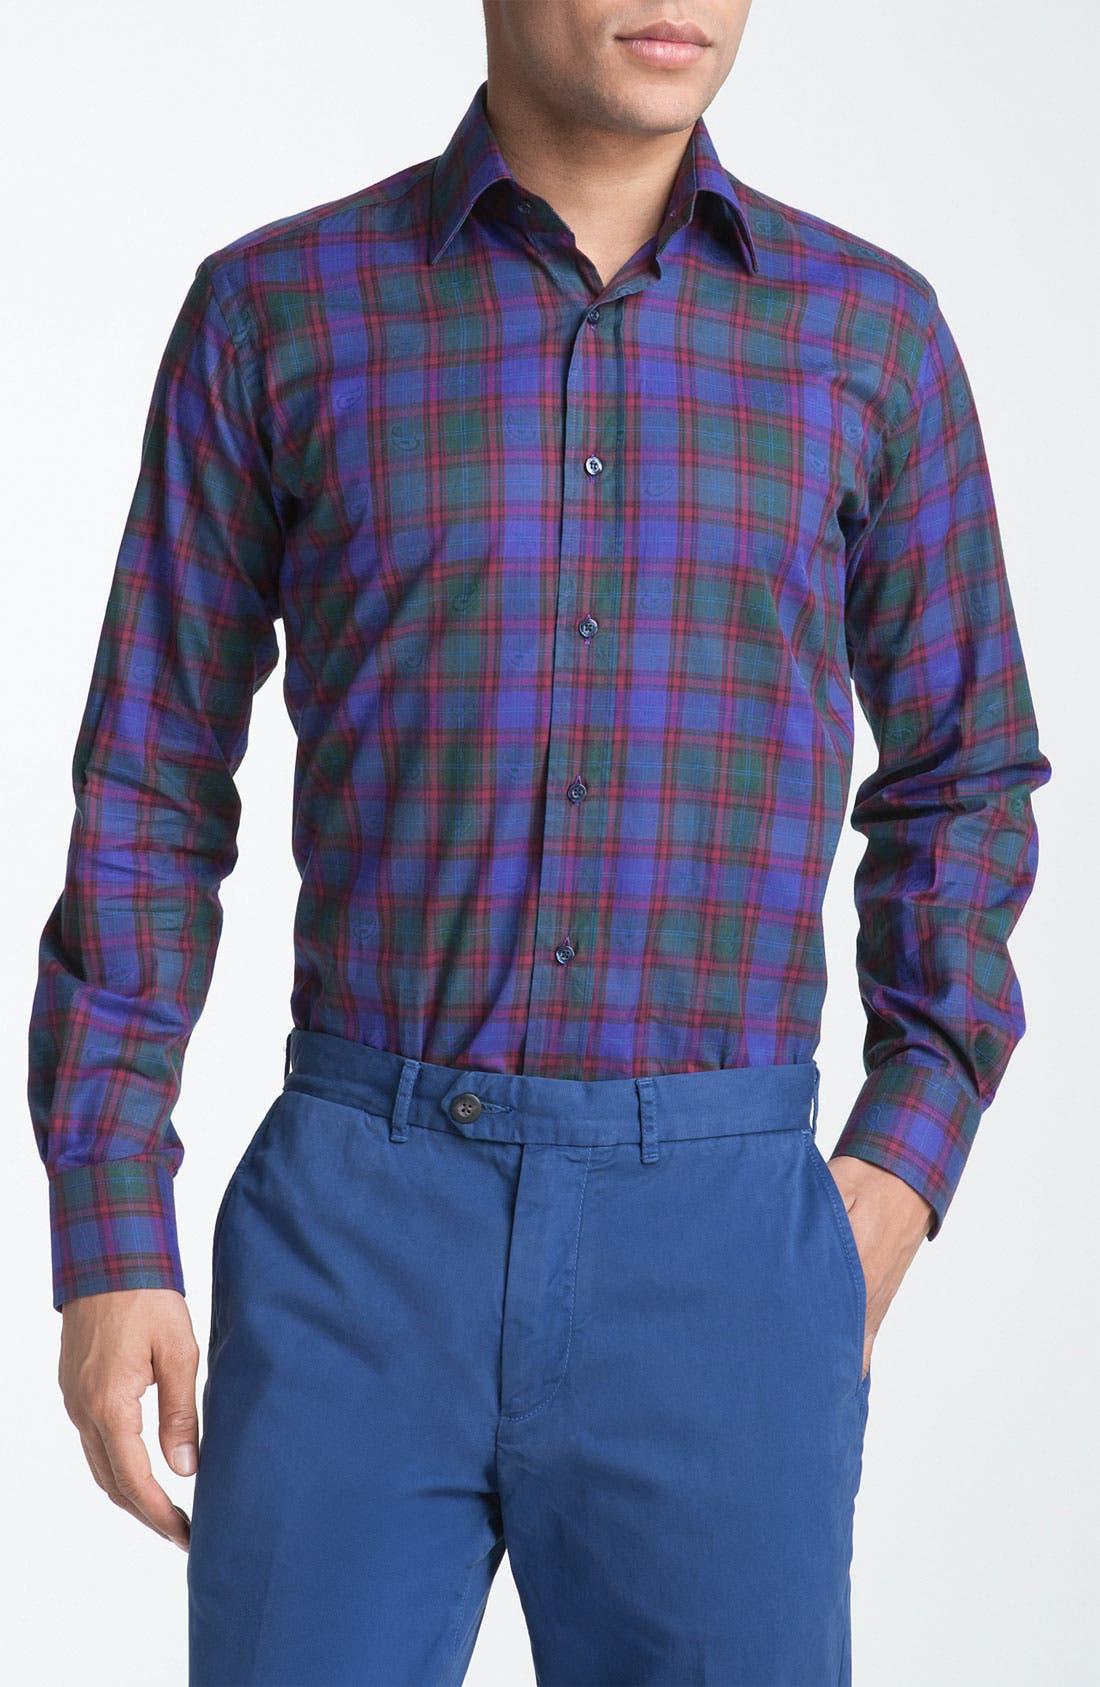 Alternate Image 1 Selected - Etro Plaid Dress Shirt